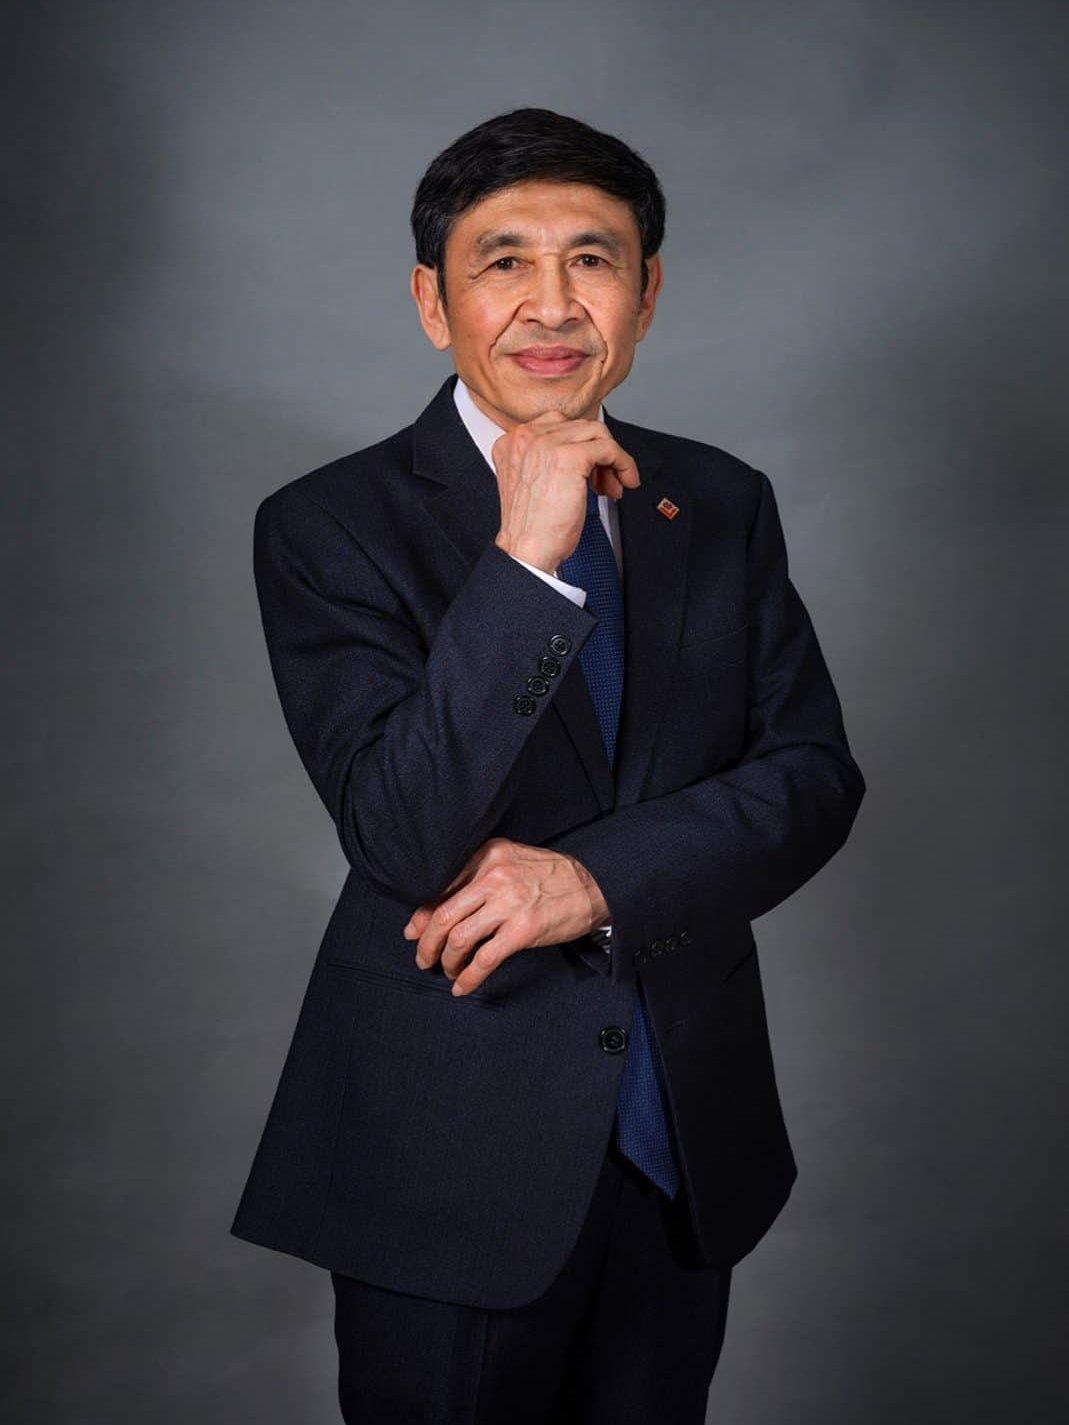 portrait_photography_annual_report_BIDV_binh_dang_vietnam_hanoi_hochiminh-asia-photographer (3)